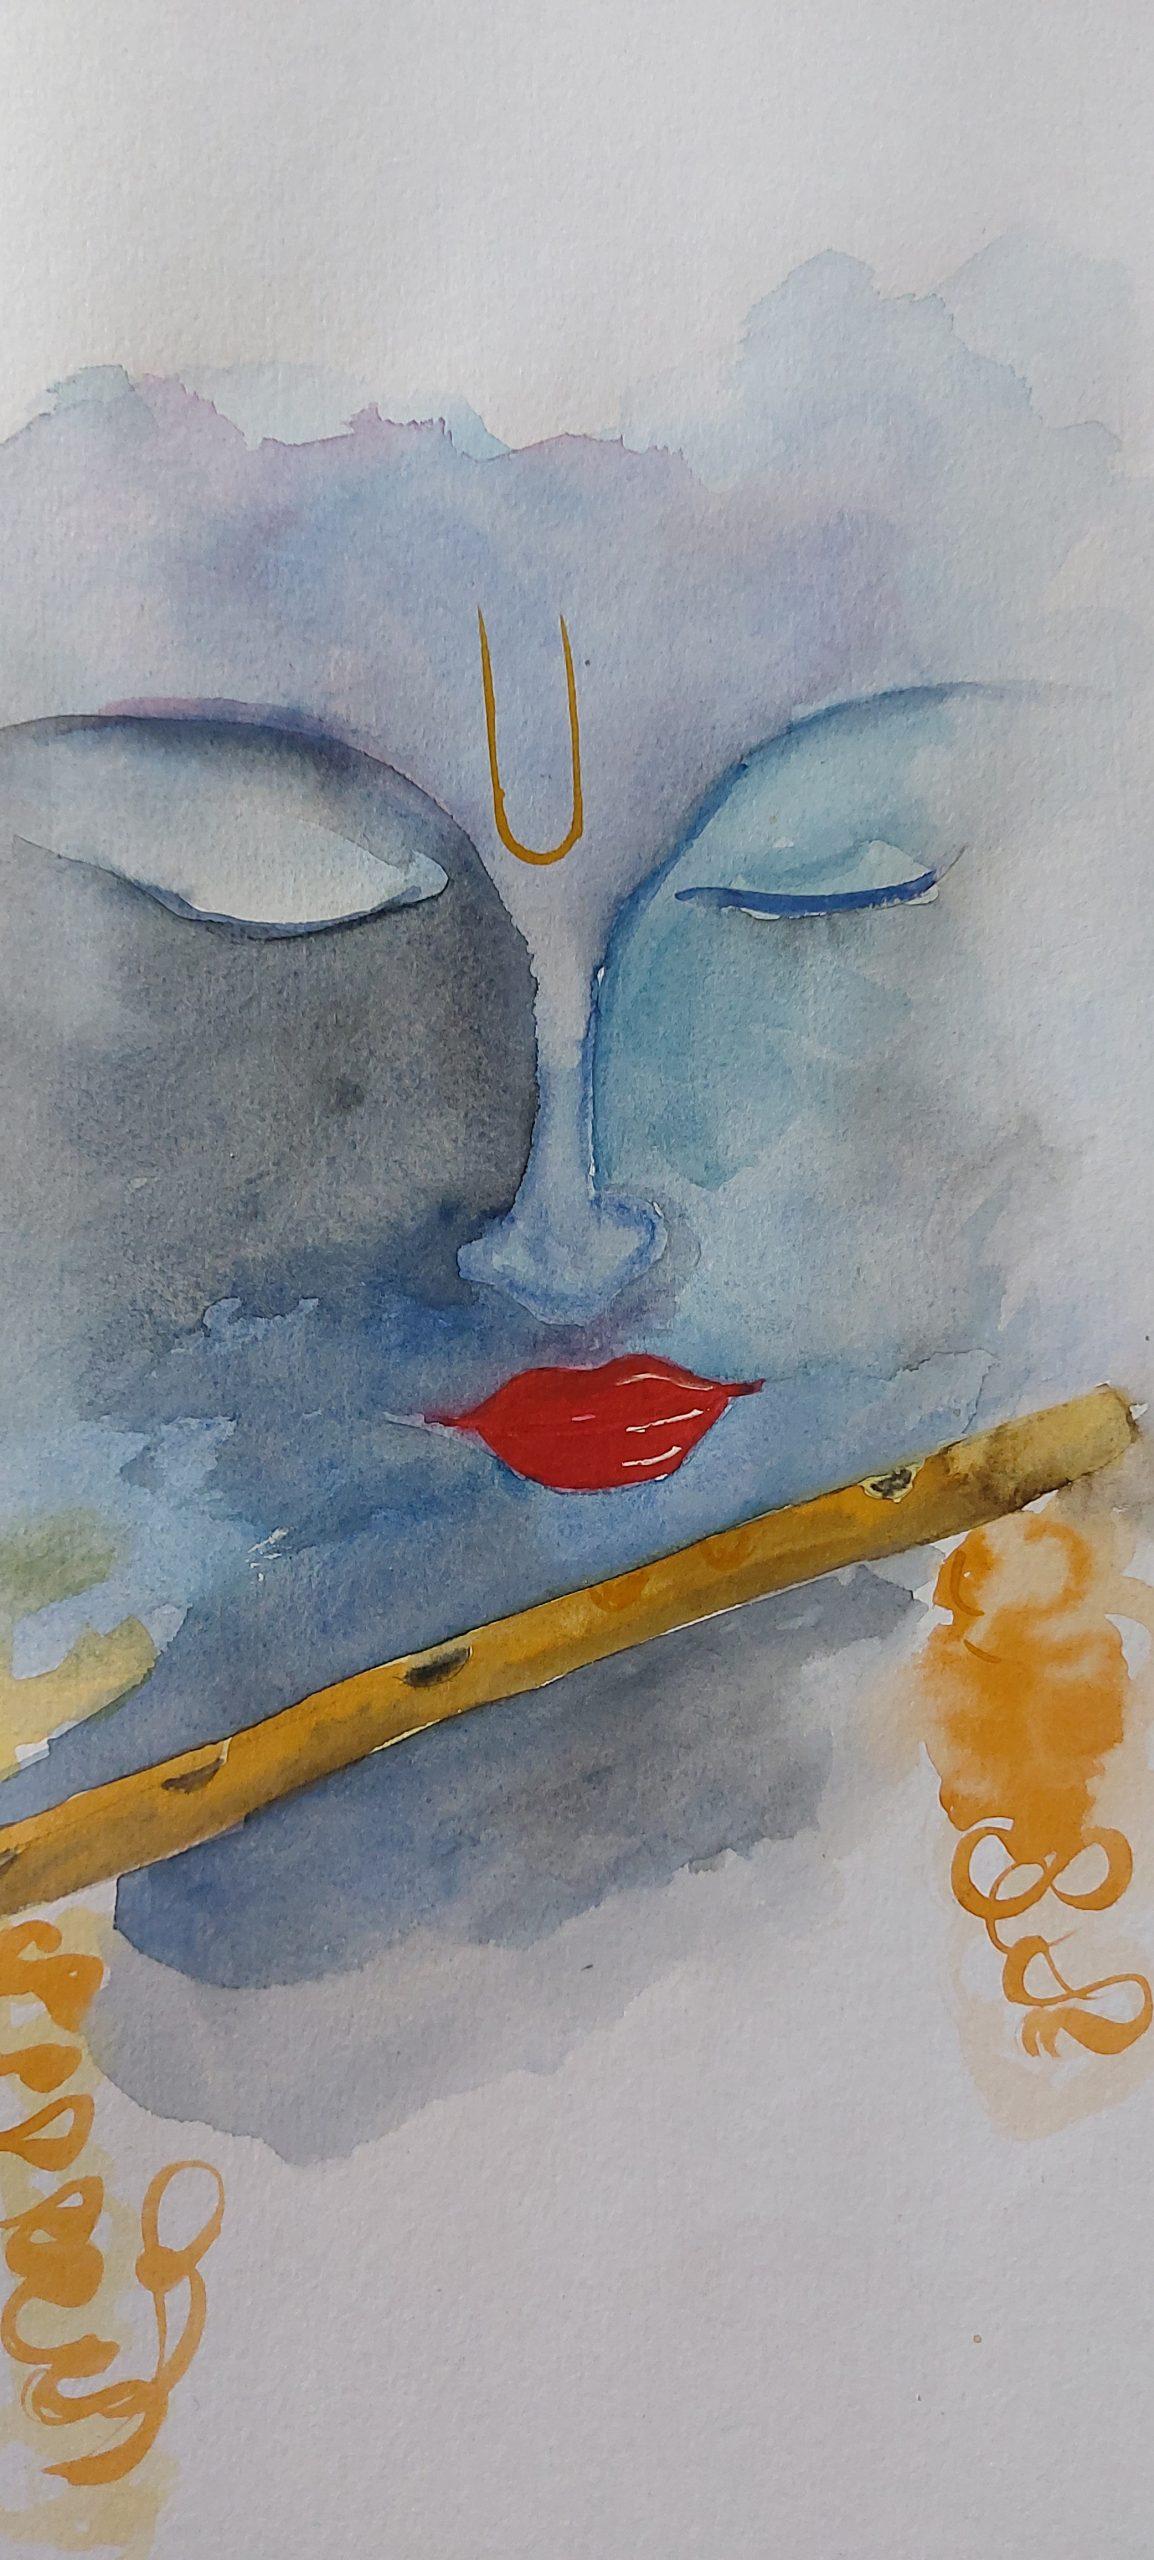 Lord Krishna and flute illustration